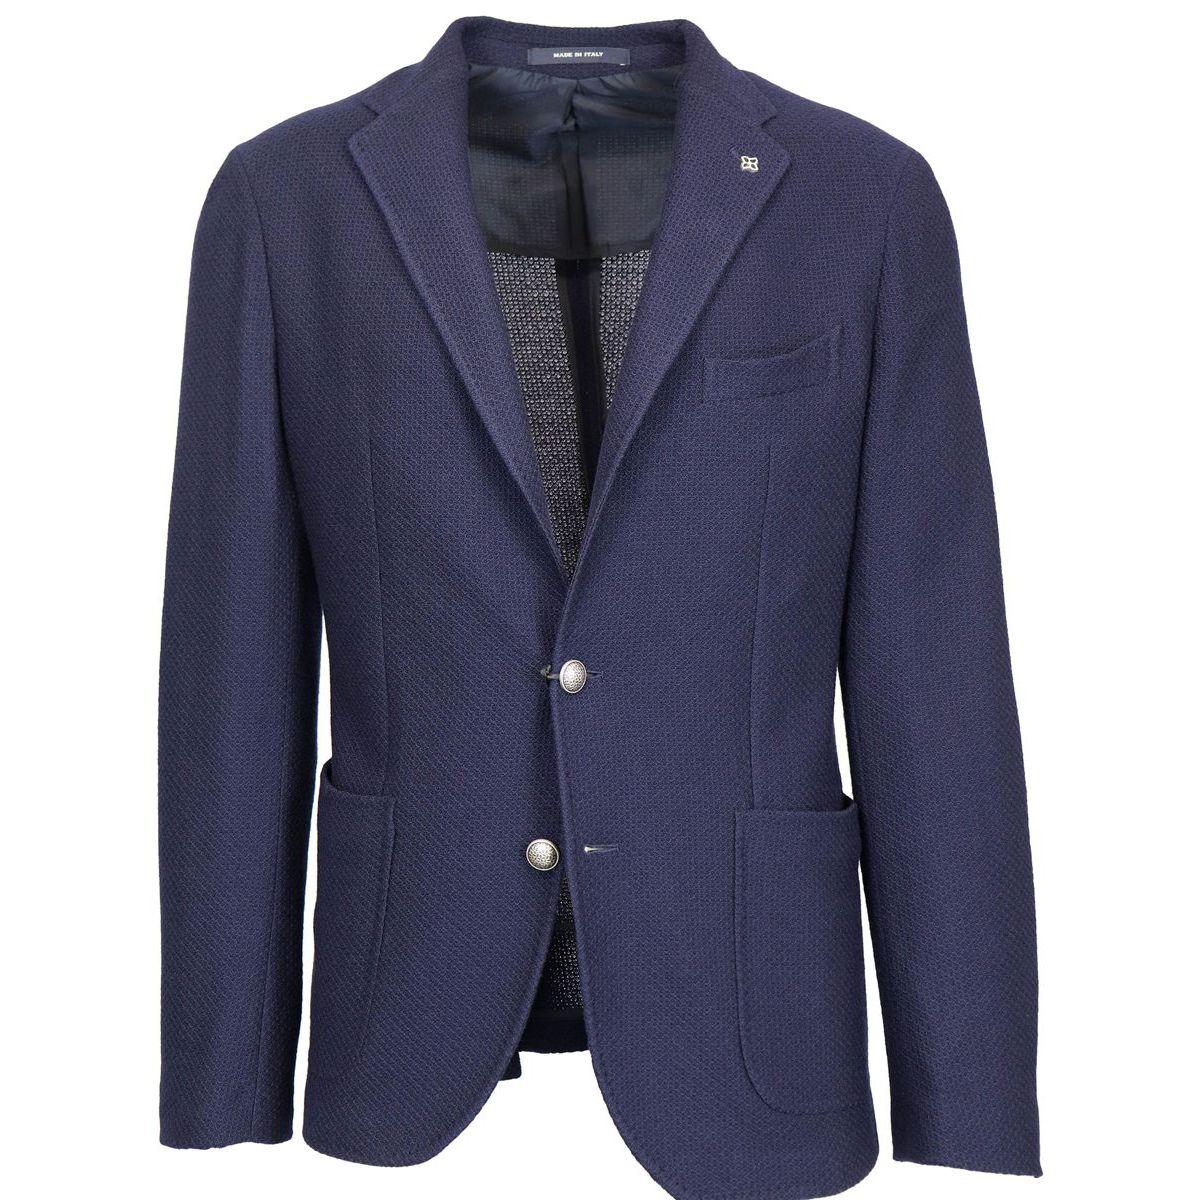 Wool jersey jacket Navy Tagliatore